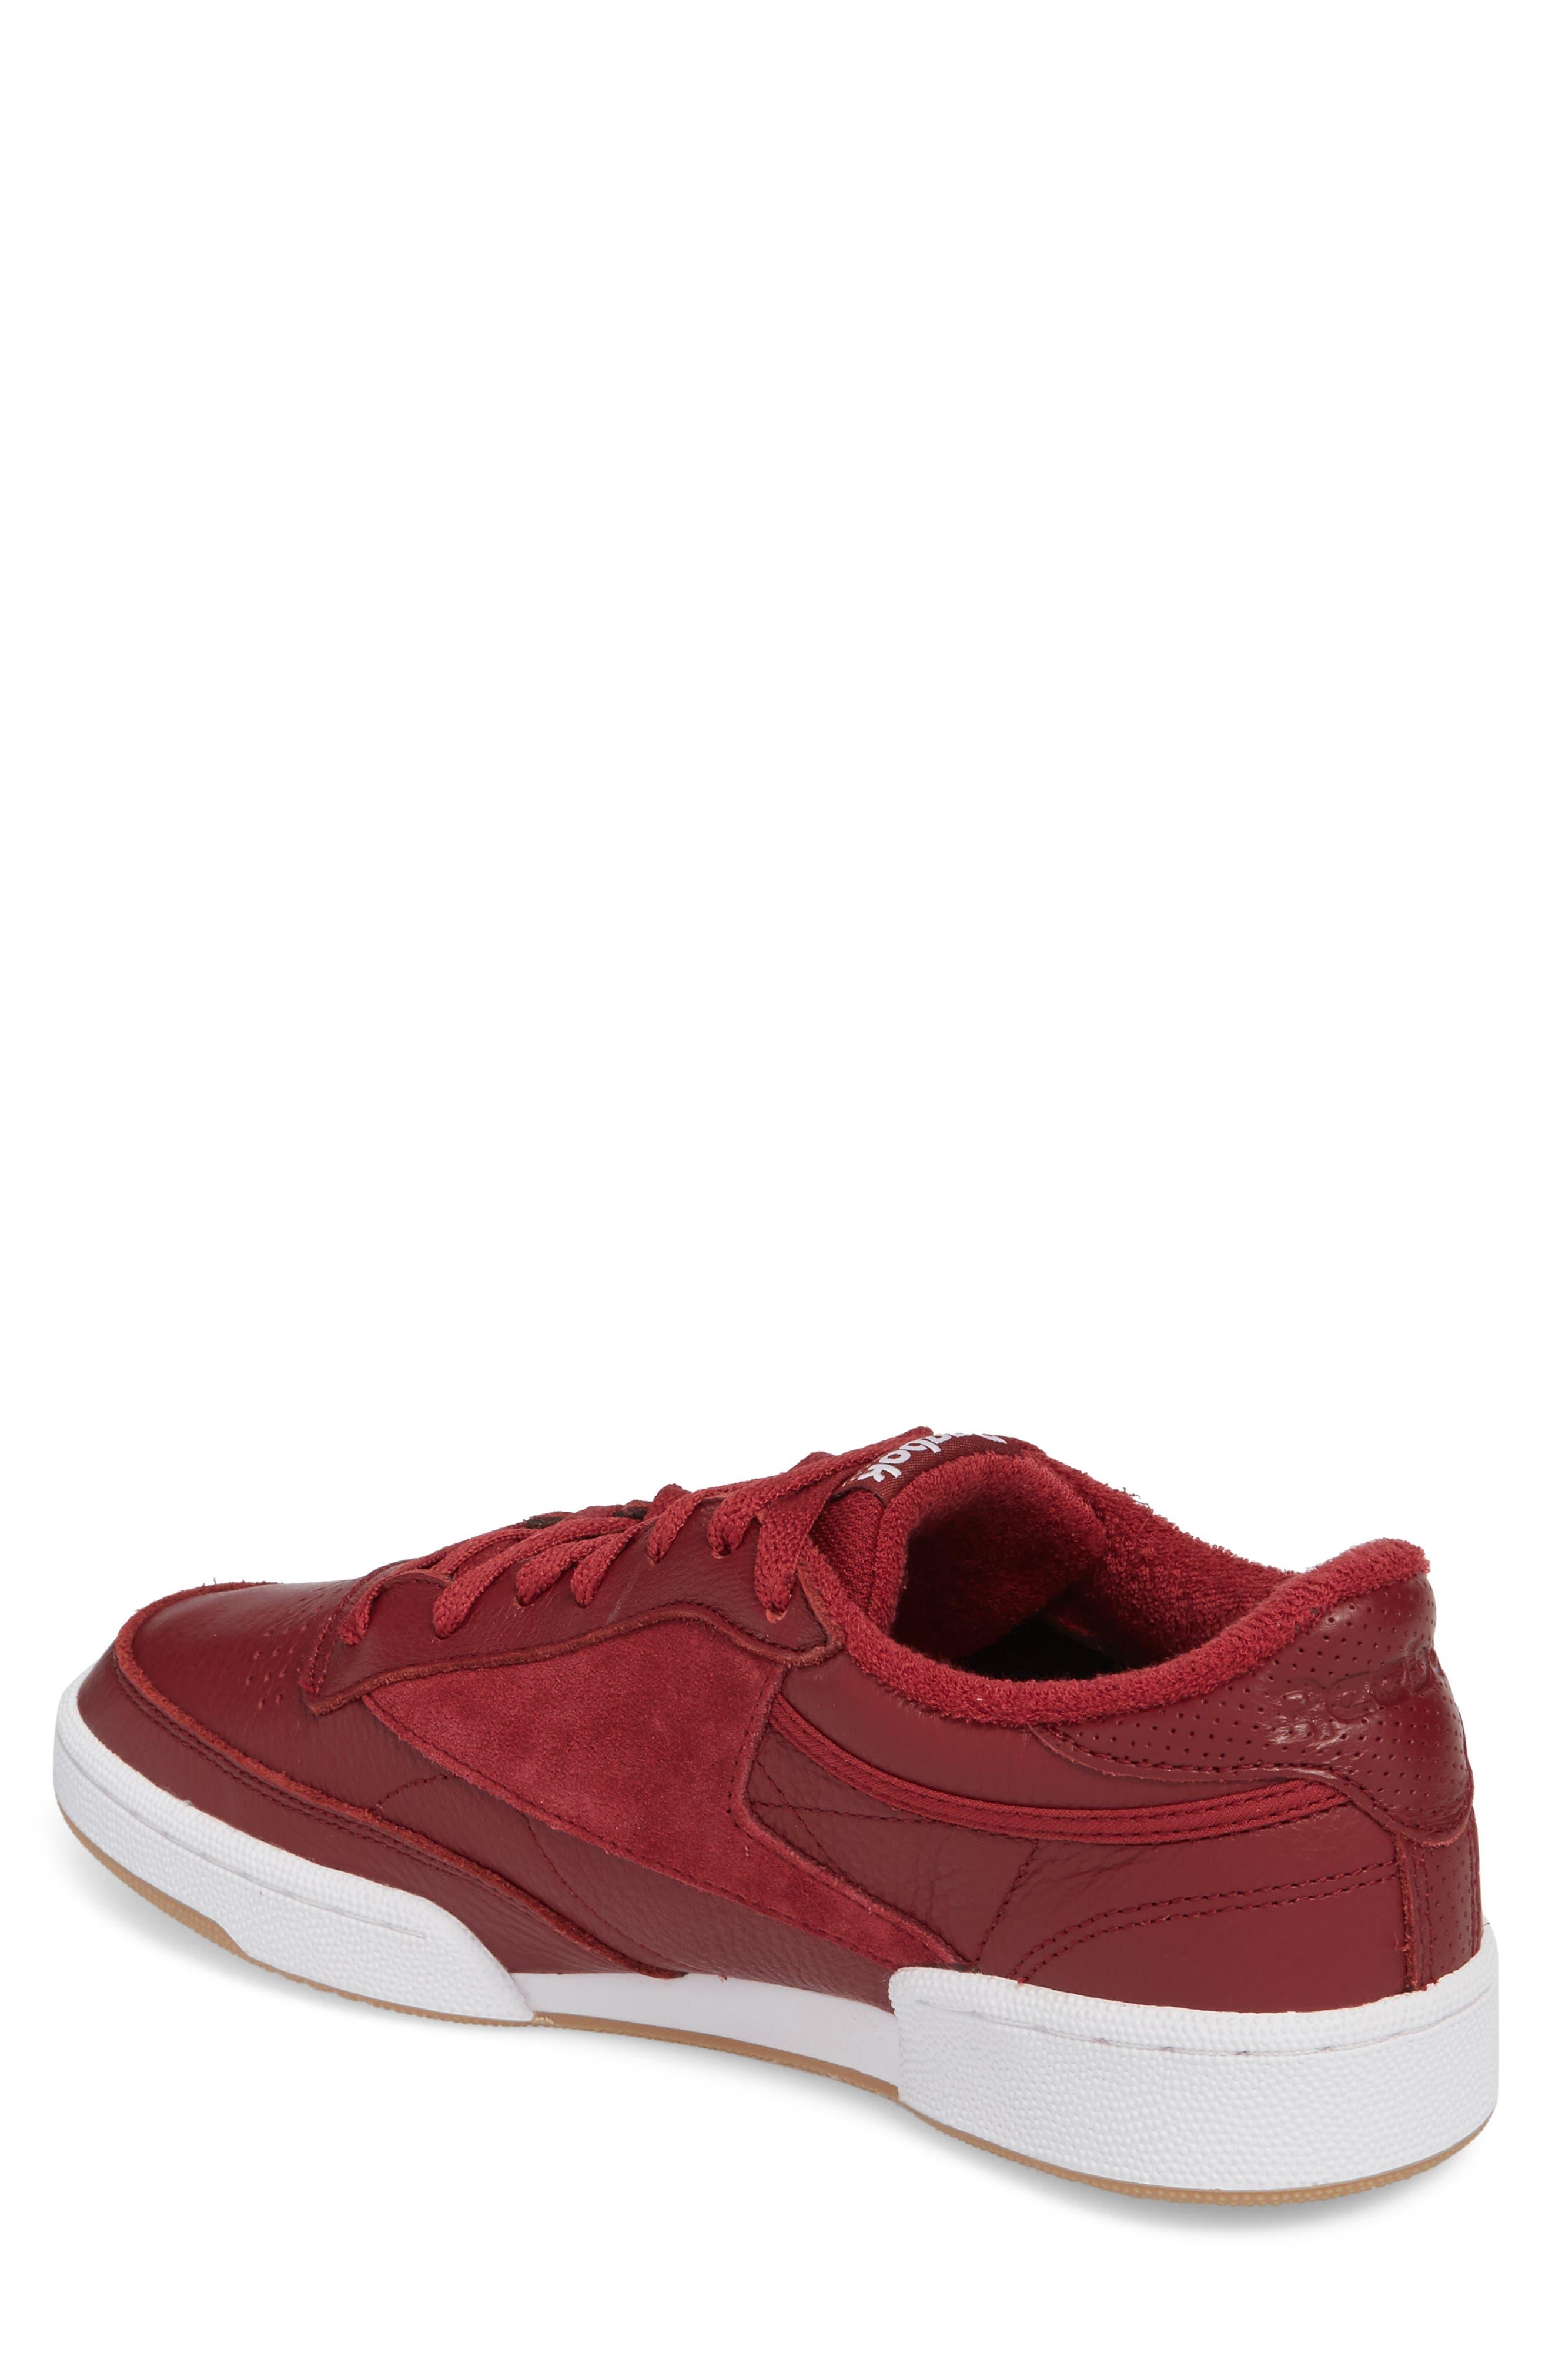 Club C 85 ESTL Sneaker,                             Alternate thumbnail 4, color,